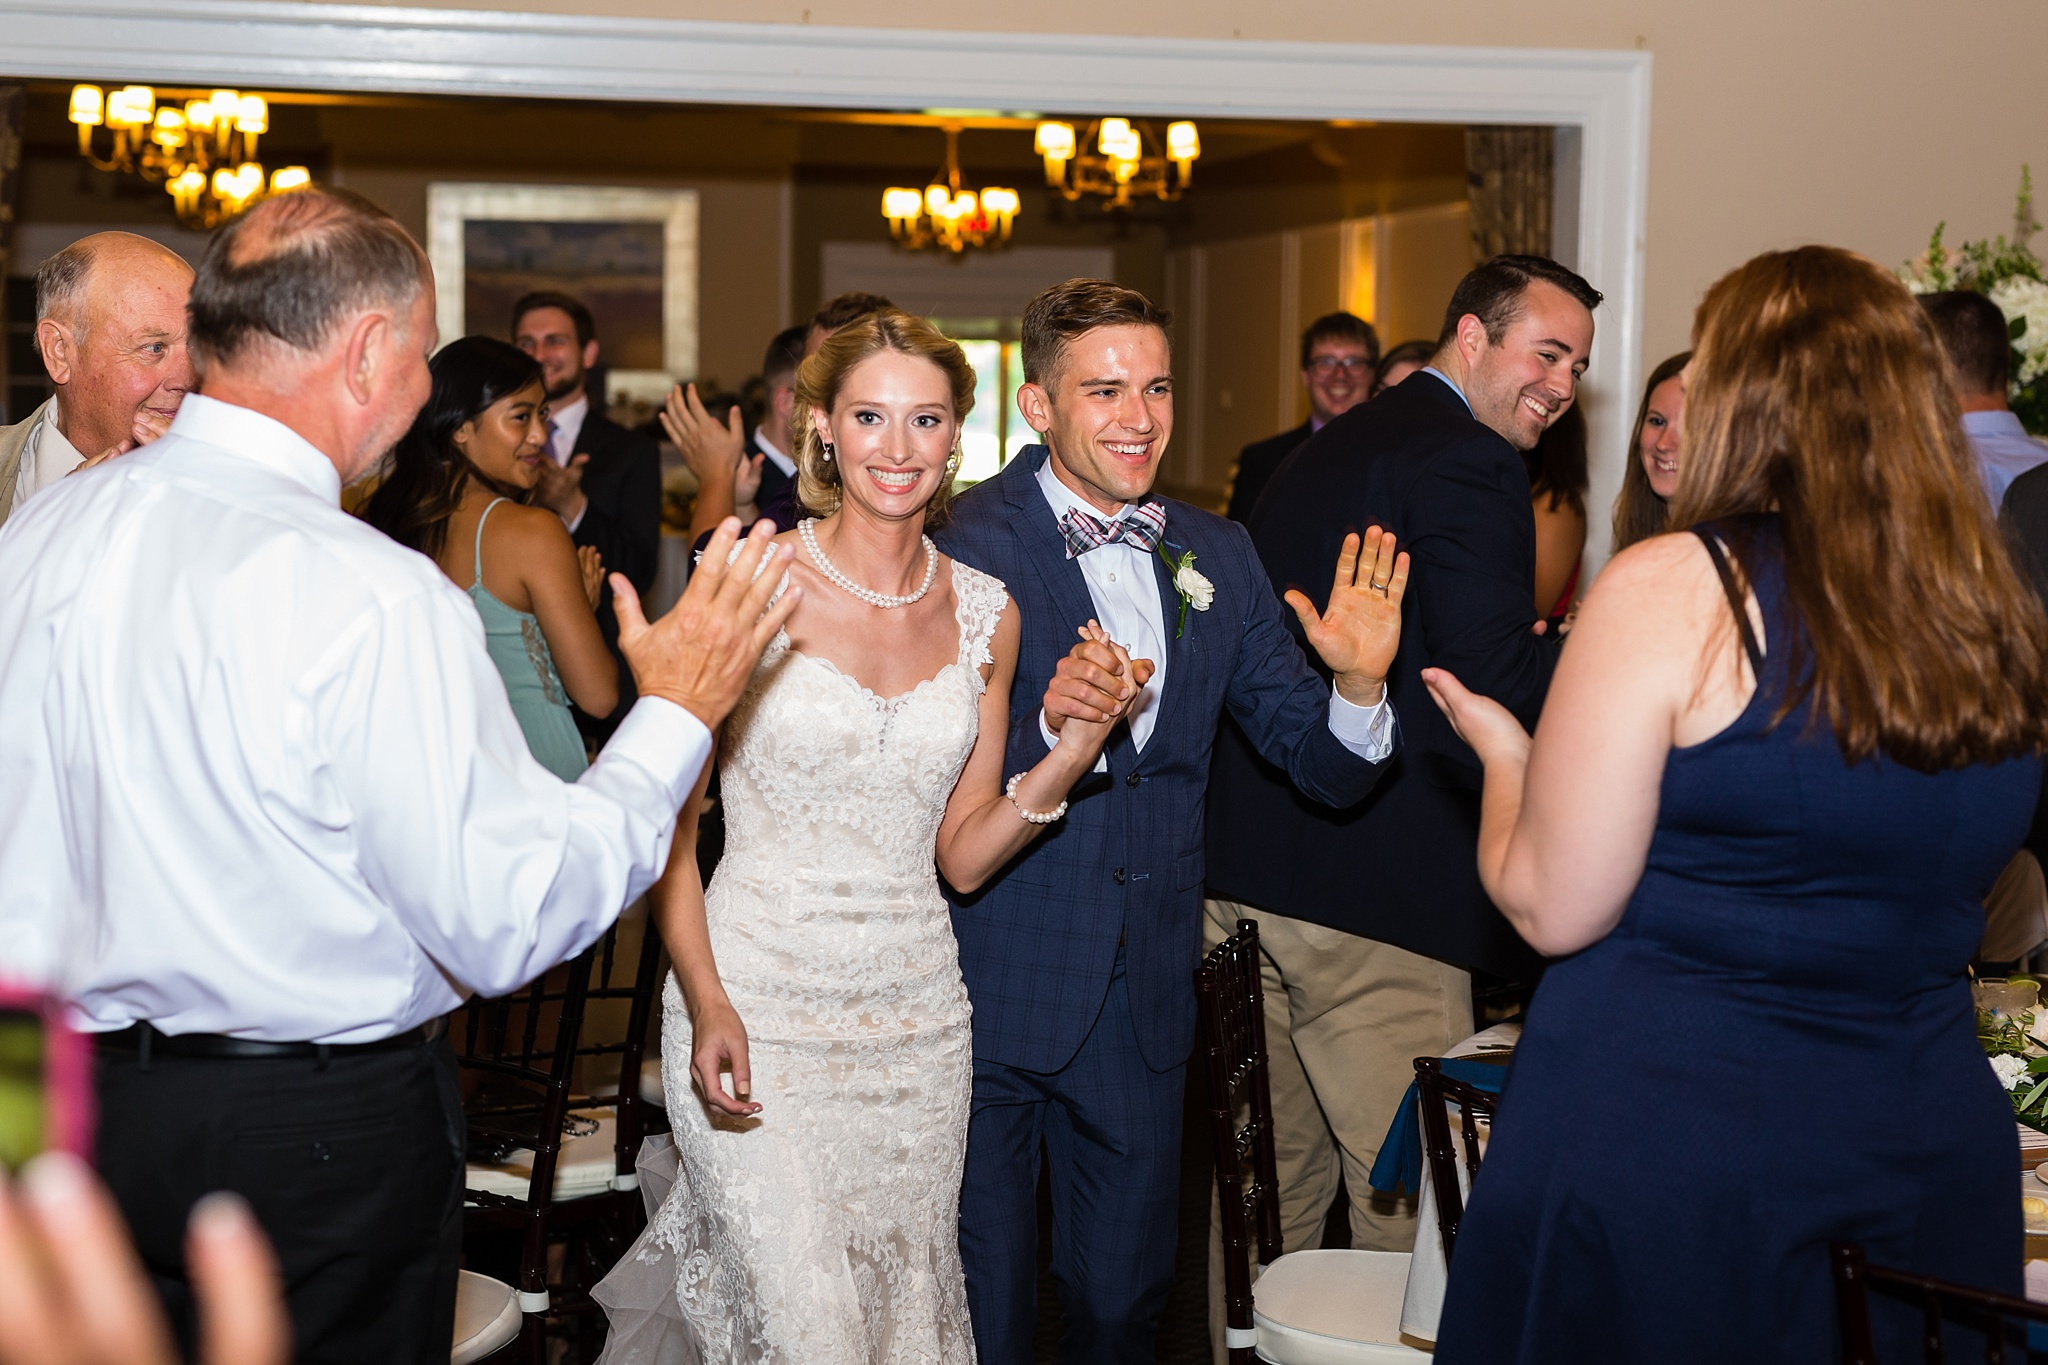 Becky_Cameron_Grand_Rapids_Blythefield Country_Club_Wedding054.JPG